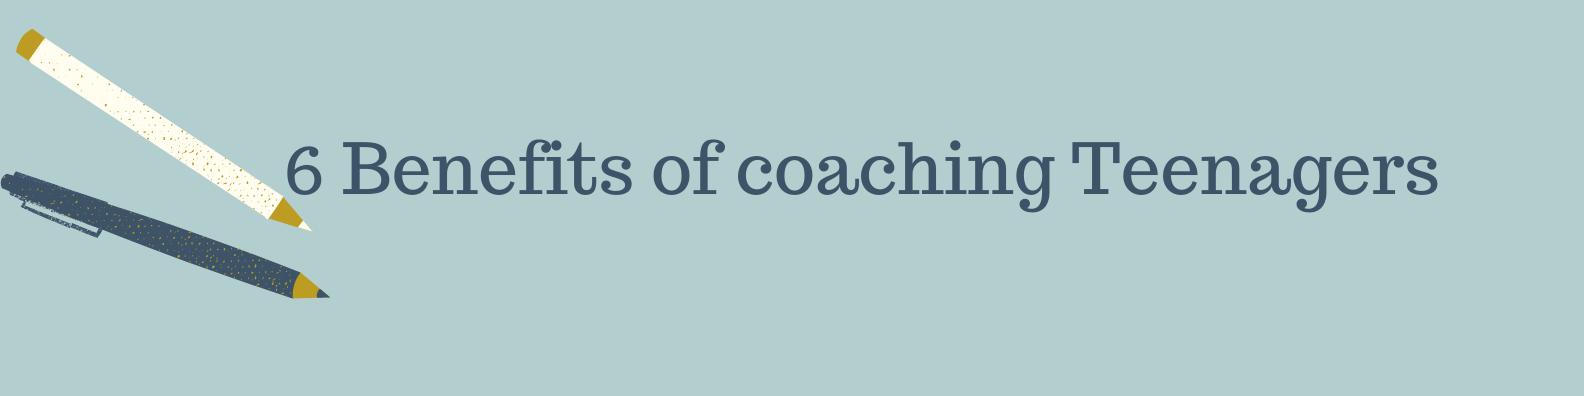 6 benefits of coaching teenagerspng